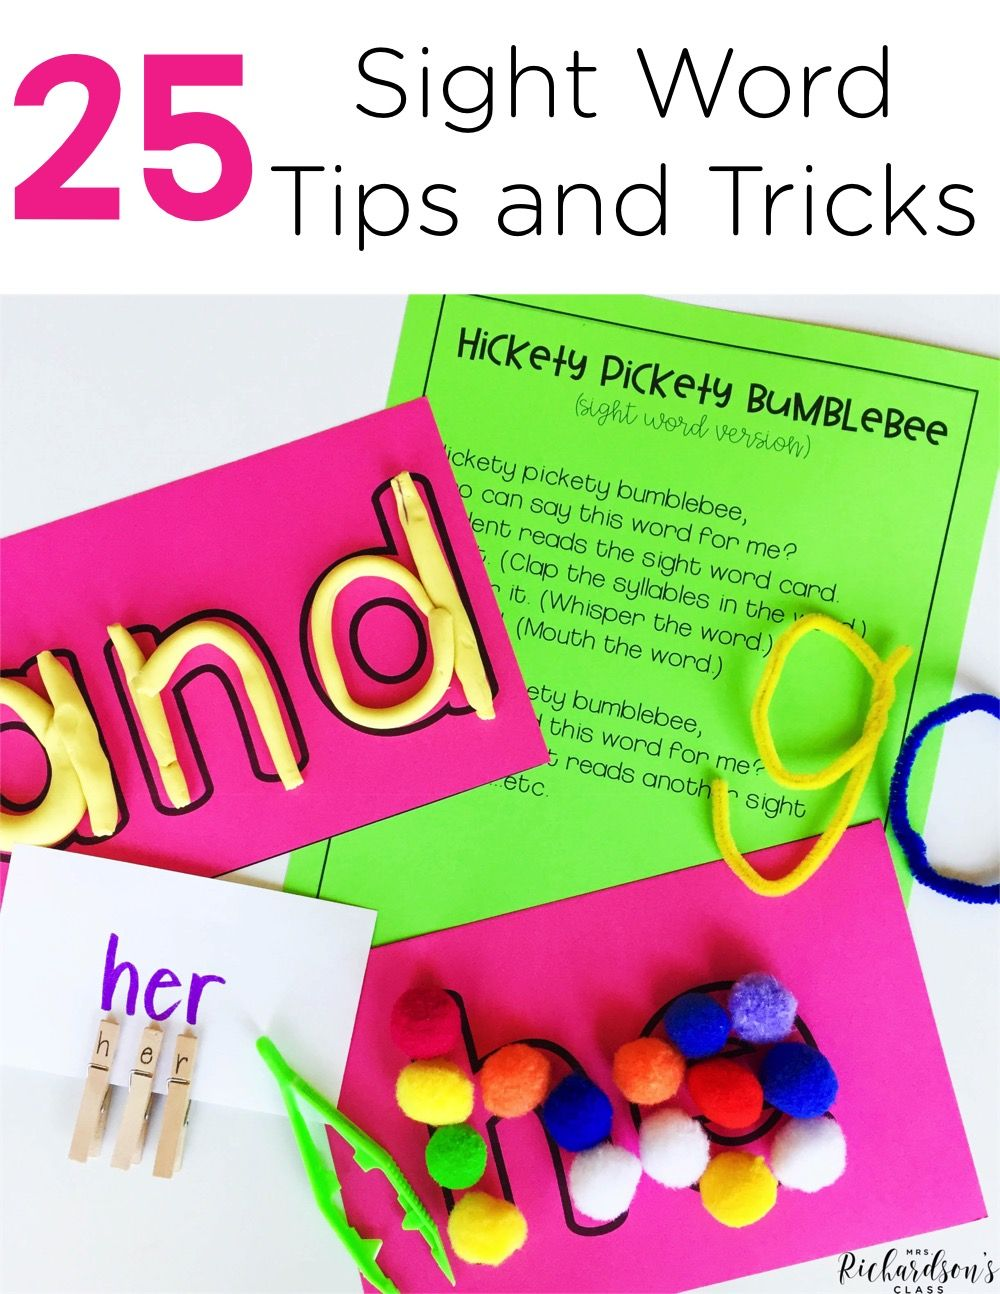 25 Sight Word Tips and Tricks   Pinterest   Englisch